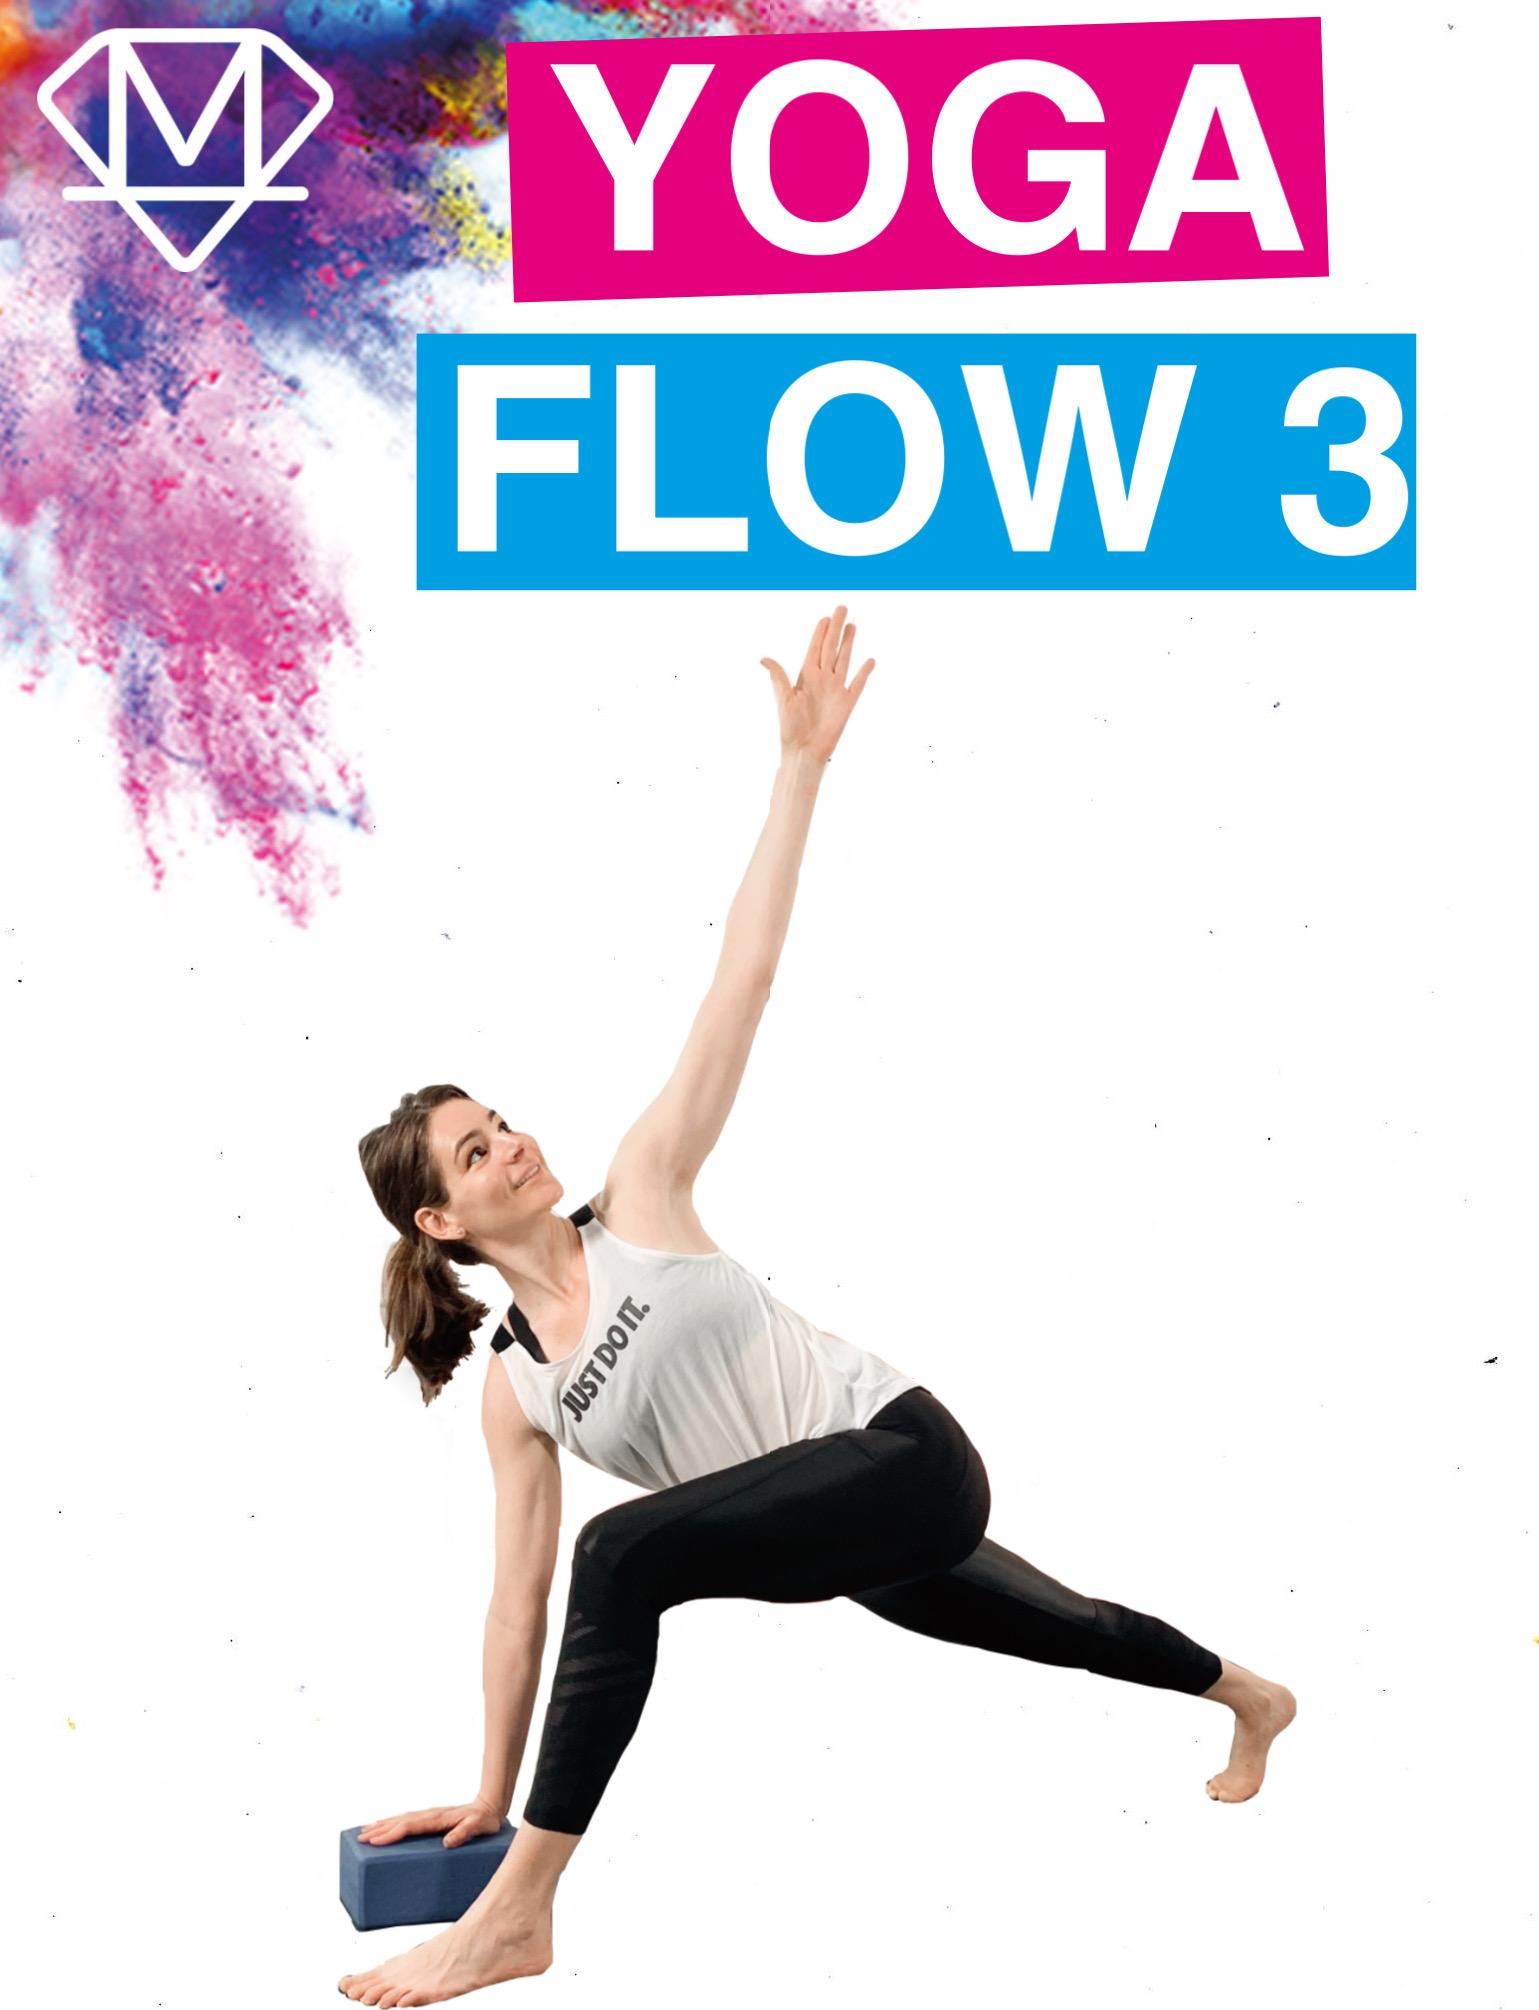 Yoga Flow 3